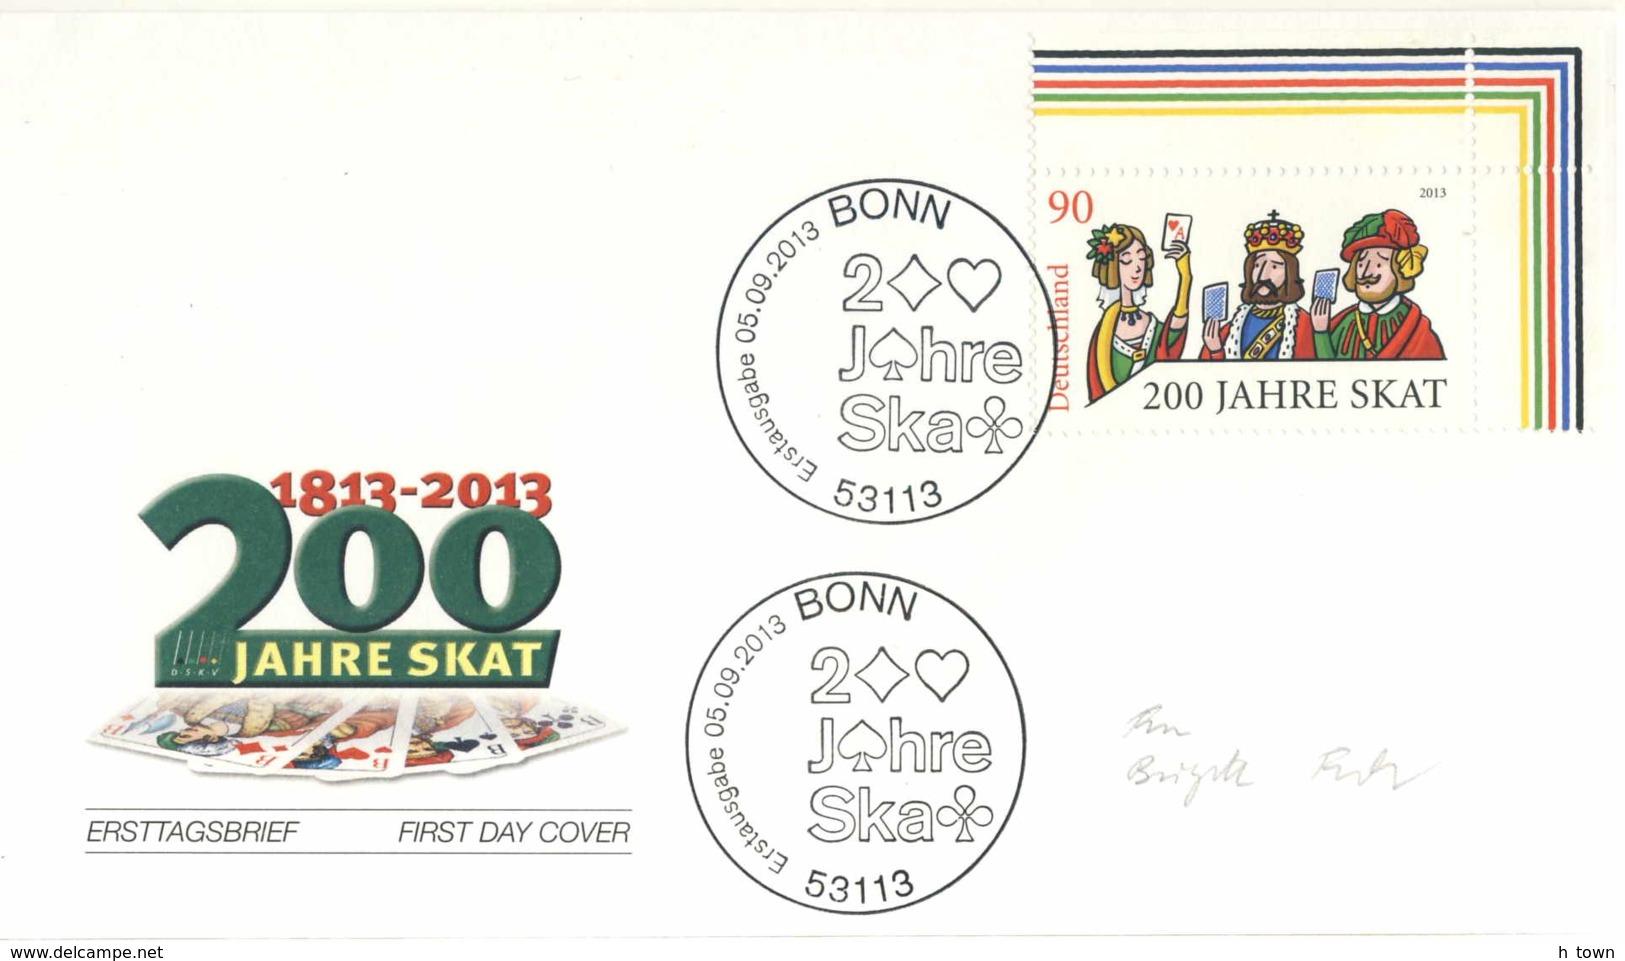 953  Skat, Jeu De Cartes: Env. Premier Jour D'Allemagne, 2013 - Playing Card FDC From Germany With Bonn Cancel - Giochi